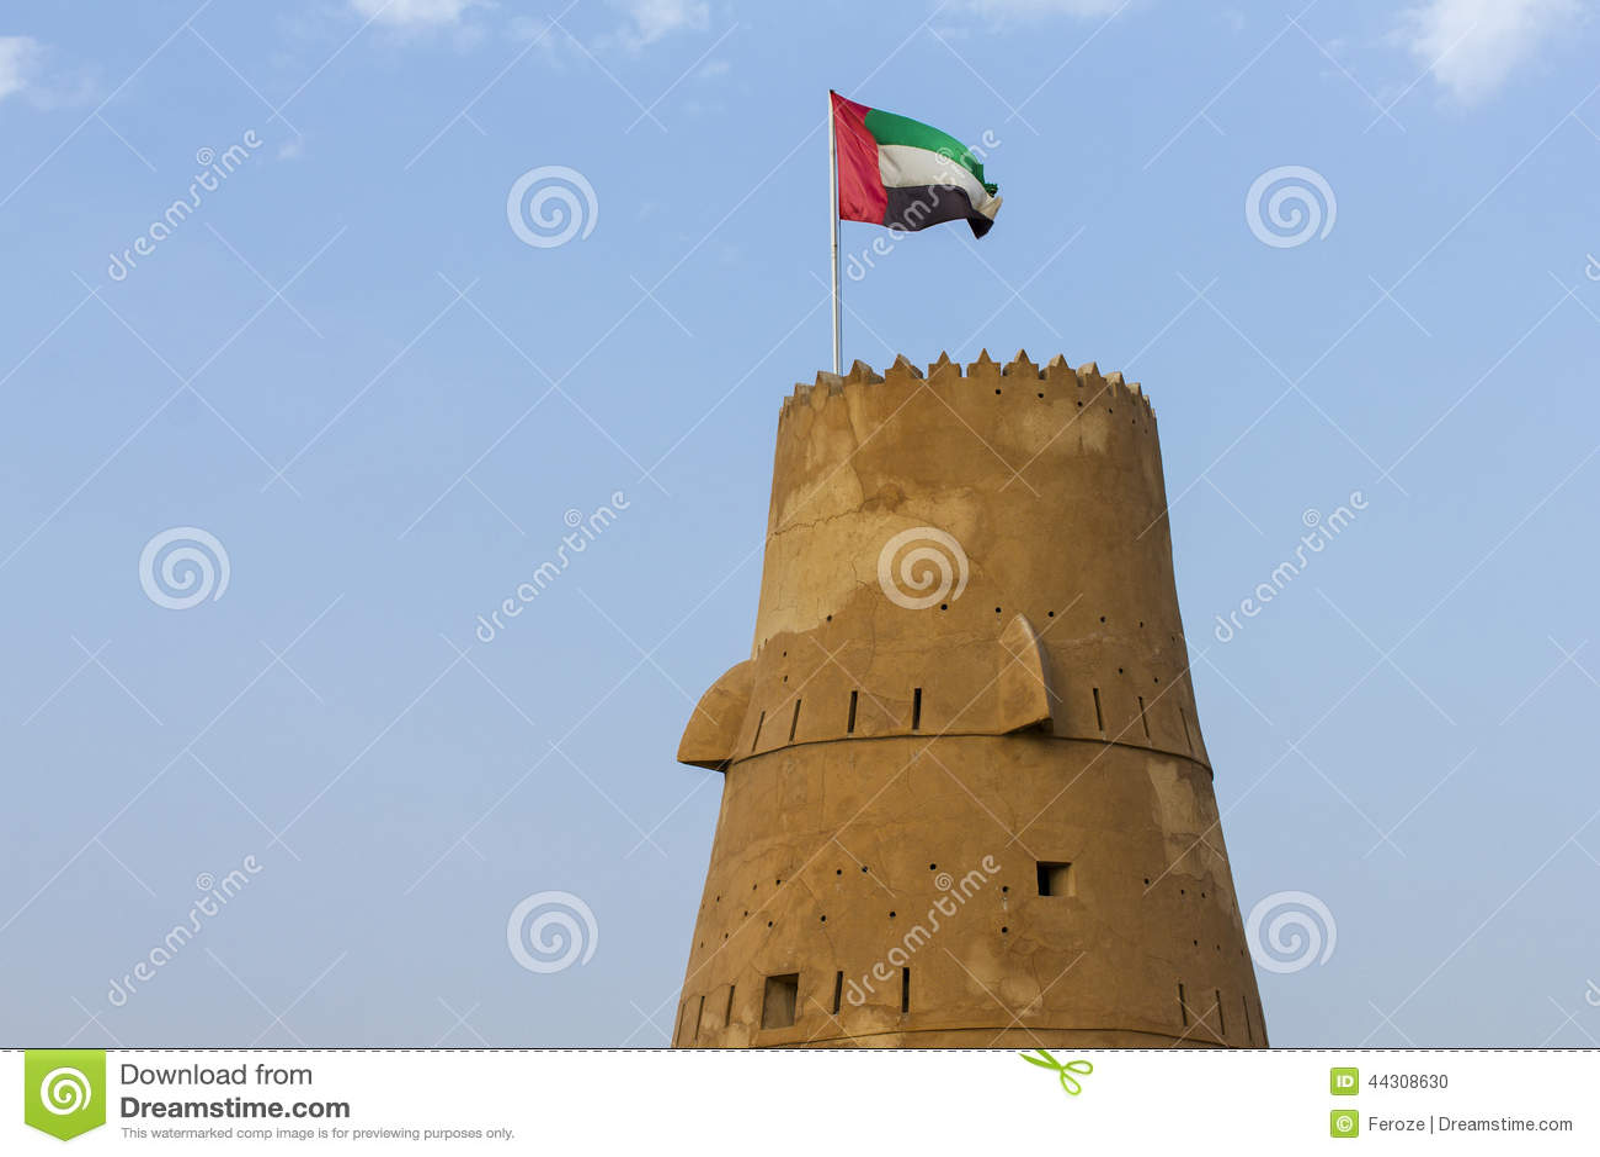 Torre del reloj en Ras Al Khaimah - United Arab Emirates